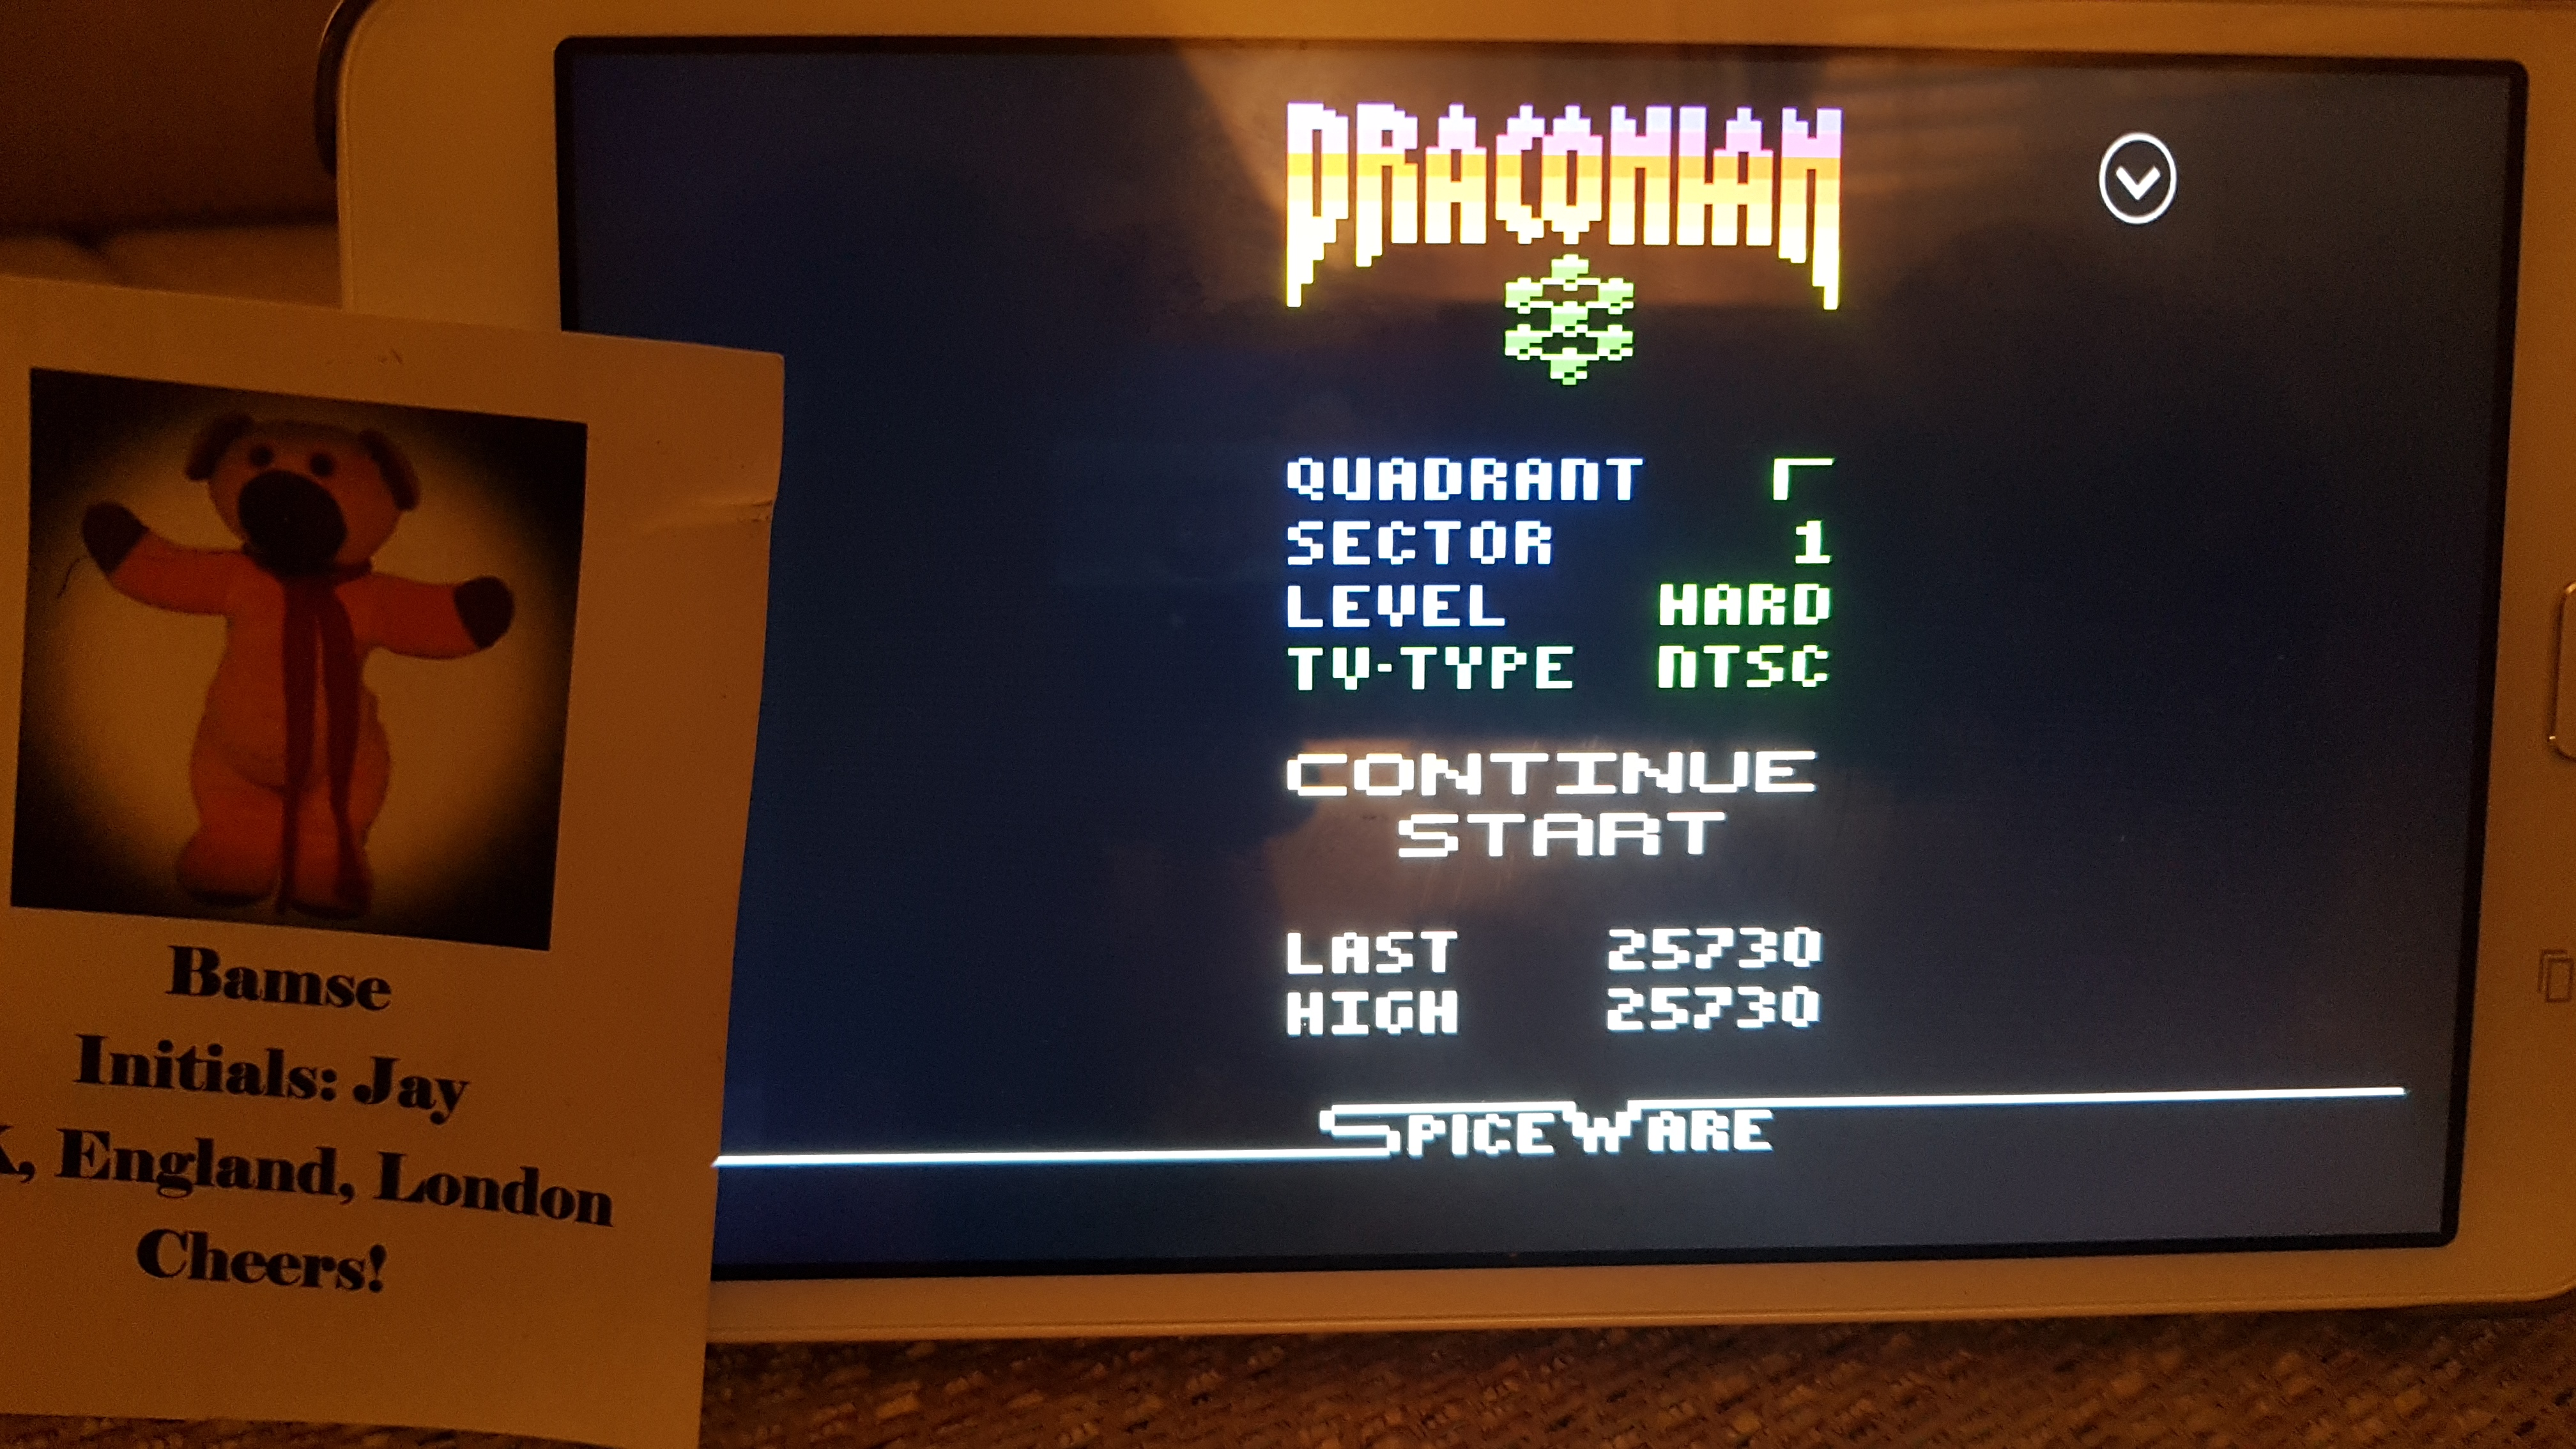 Bamse: Draconian: Quadrant Gamma / Sector 1 [Hard] (Atari 2600 Emulated) 25,730 points on 2019-07-03 17:55:27